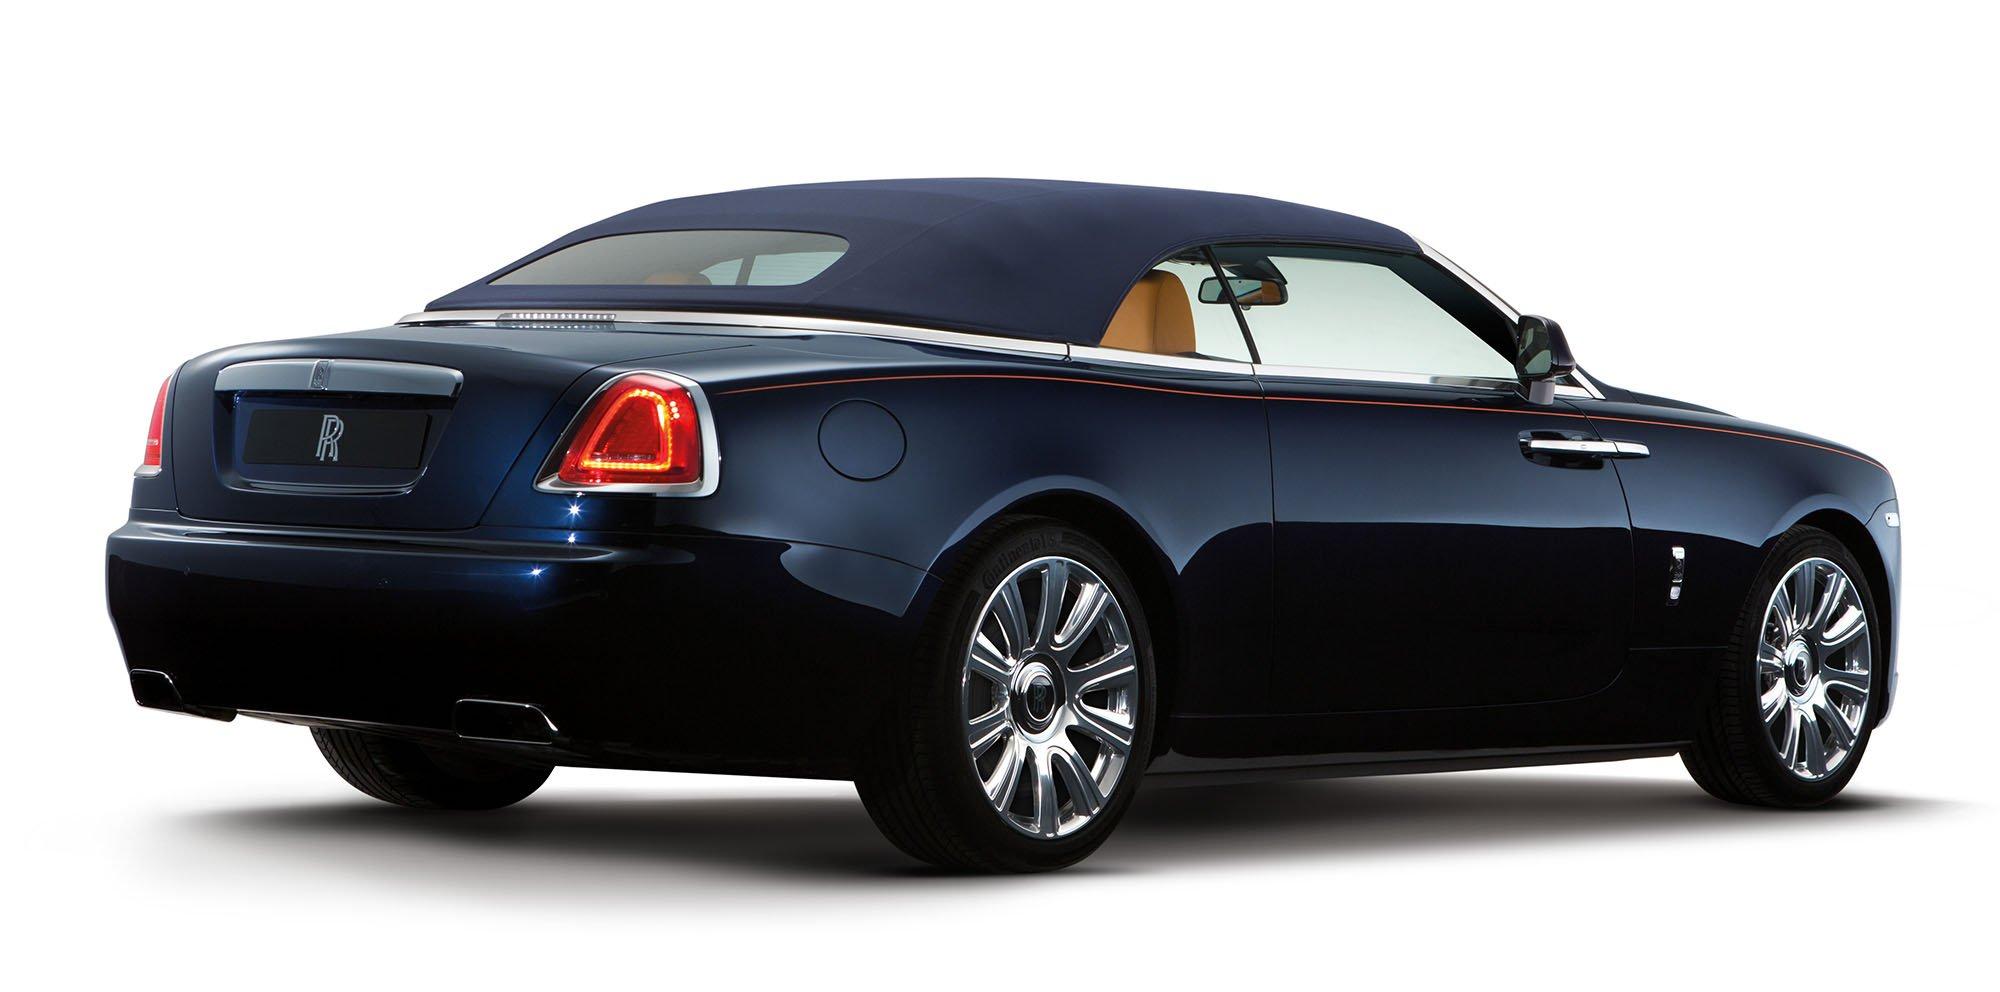 Rolls-Royce Dawn unveiled - Photos (1 of 3)